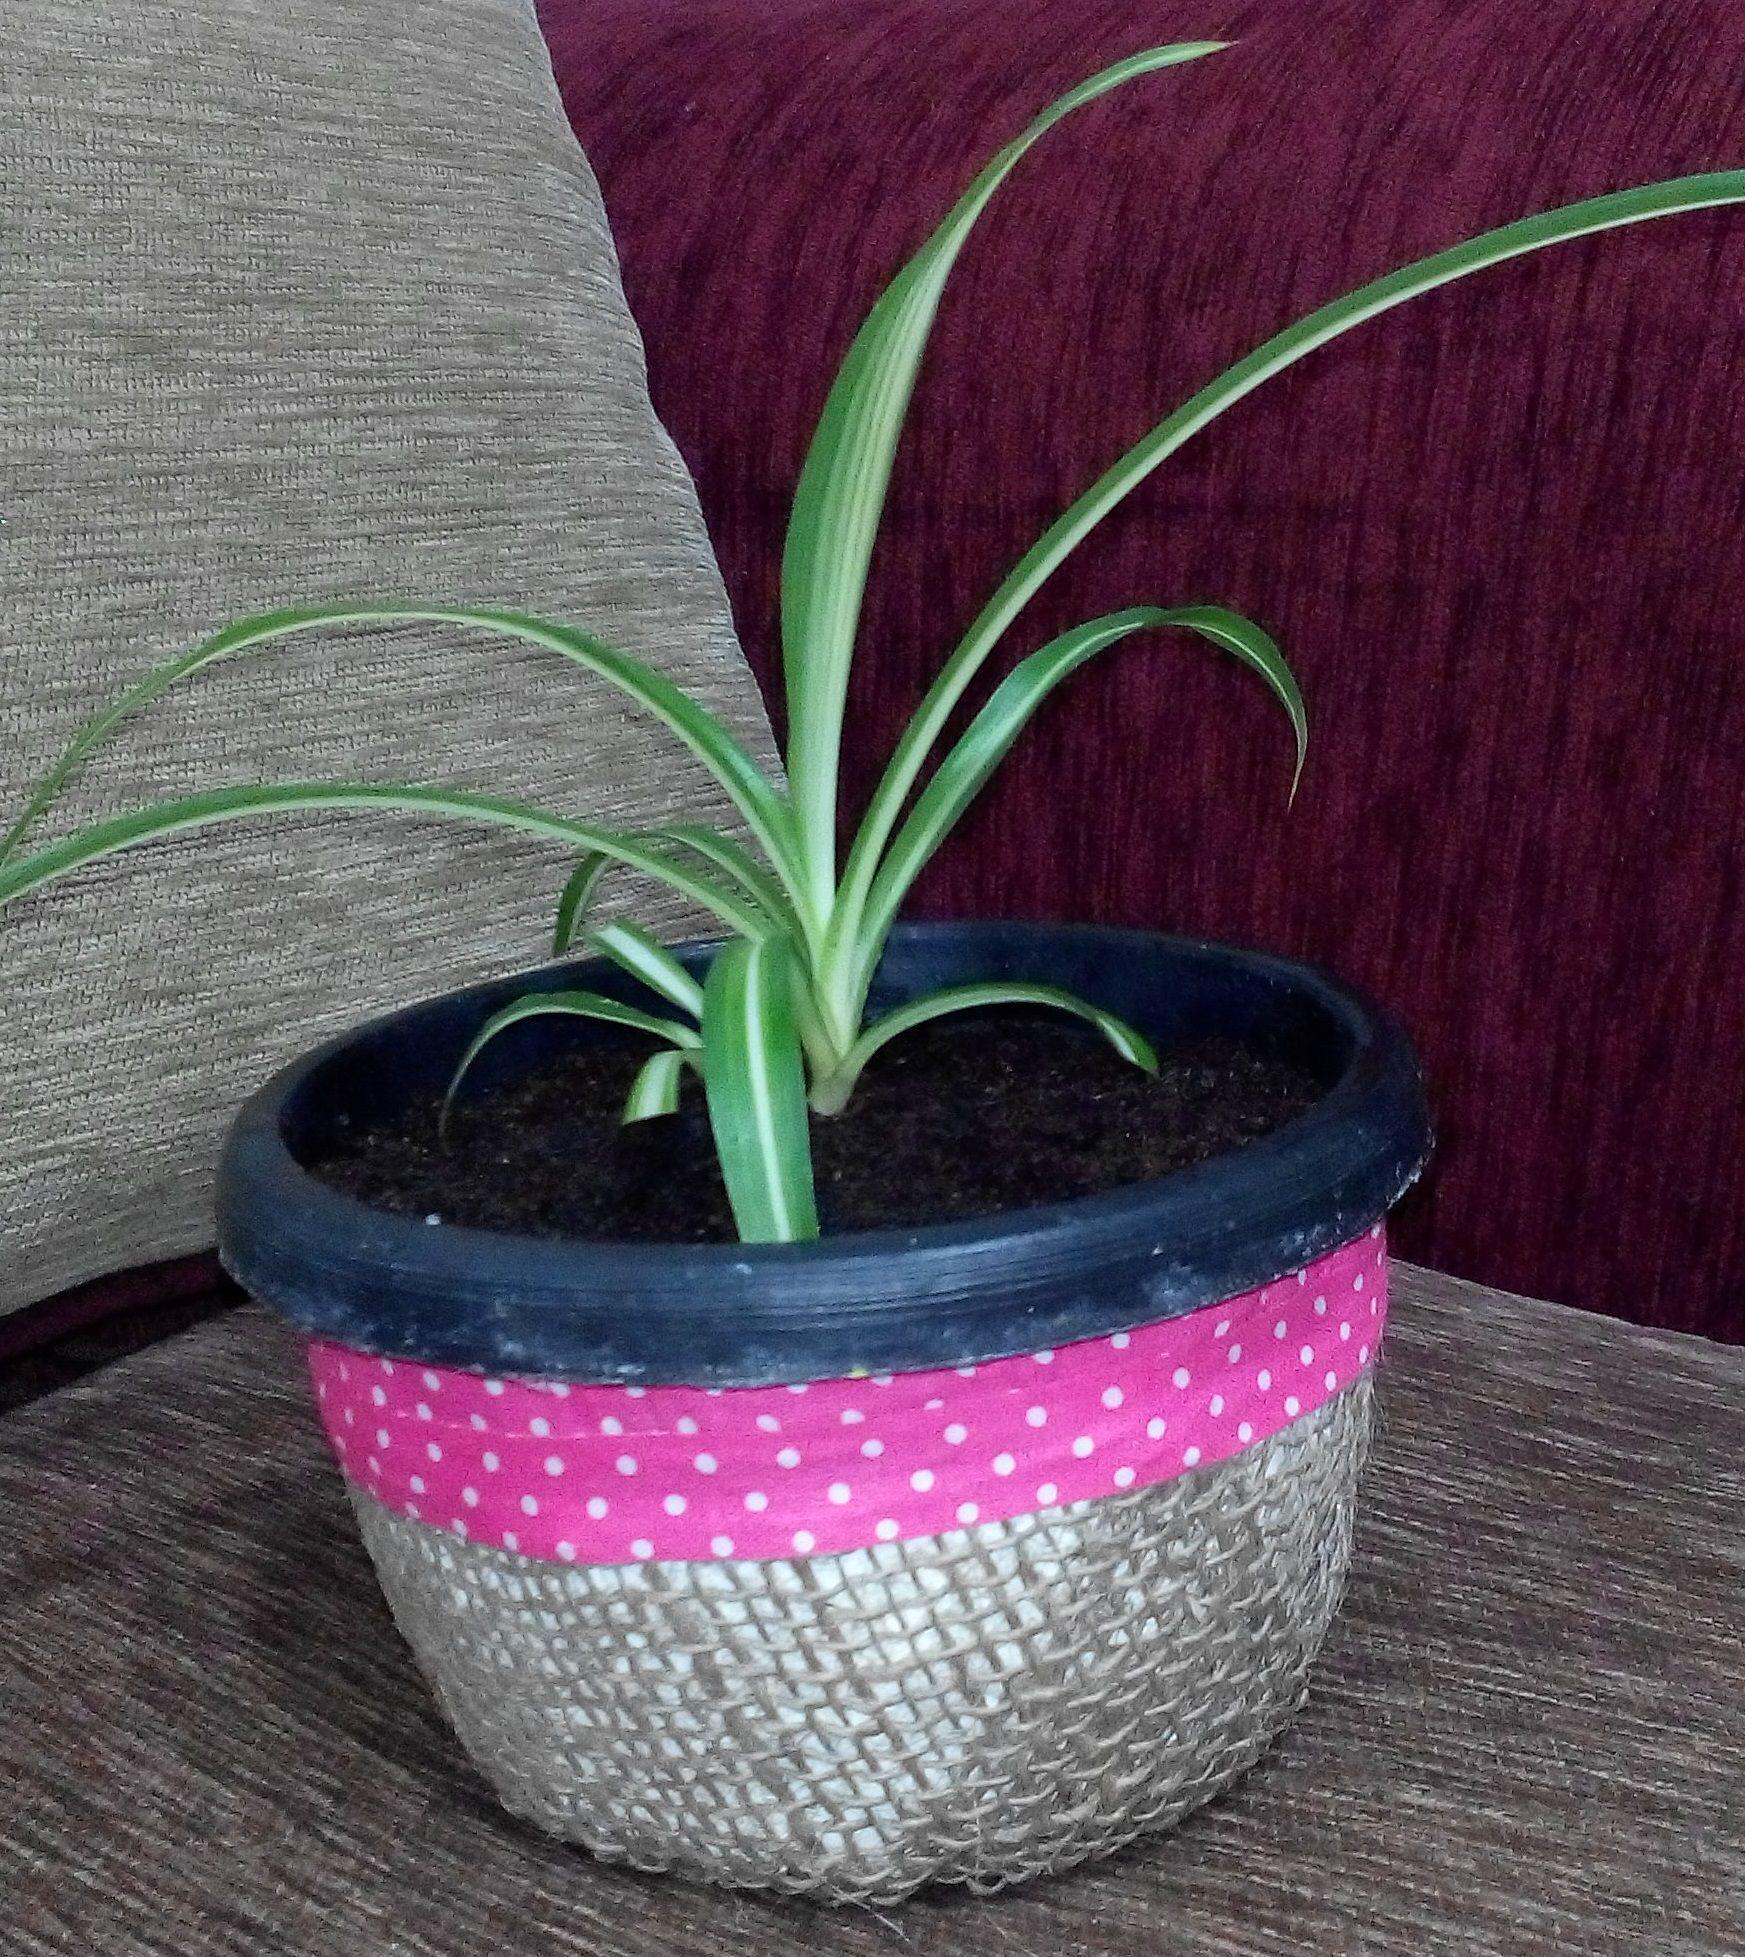 خيش و شريط قماش ملون لاصق نبات الفلانجيوم Plant Pot Burlap Spider Plant Planter Pots Planters Pot